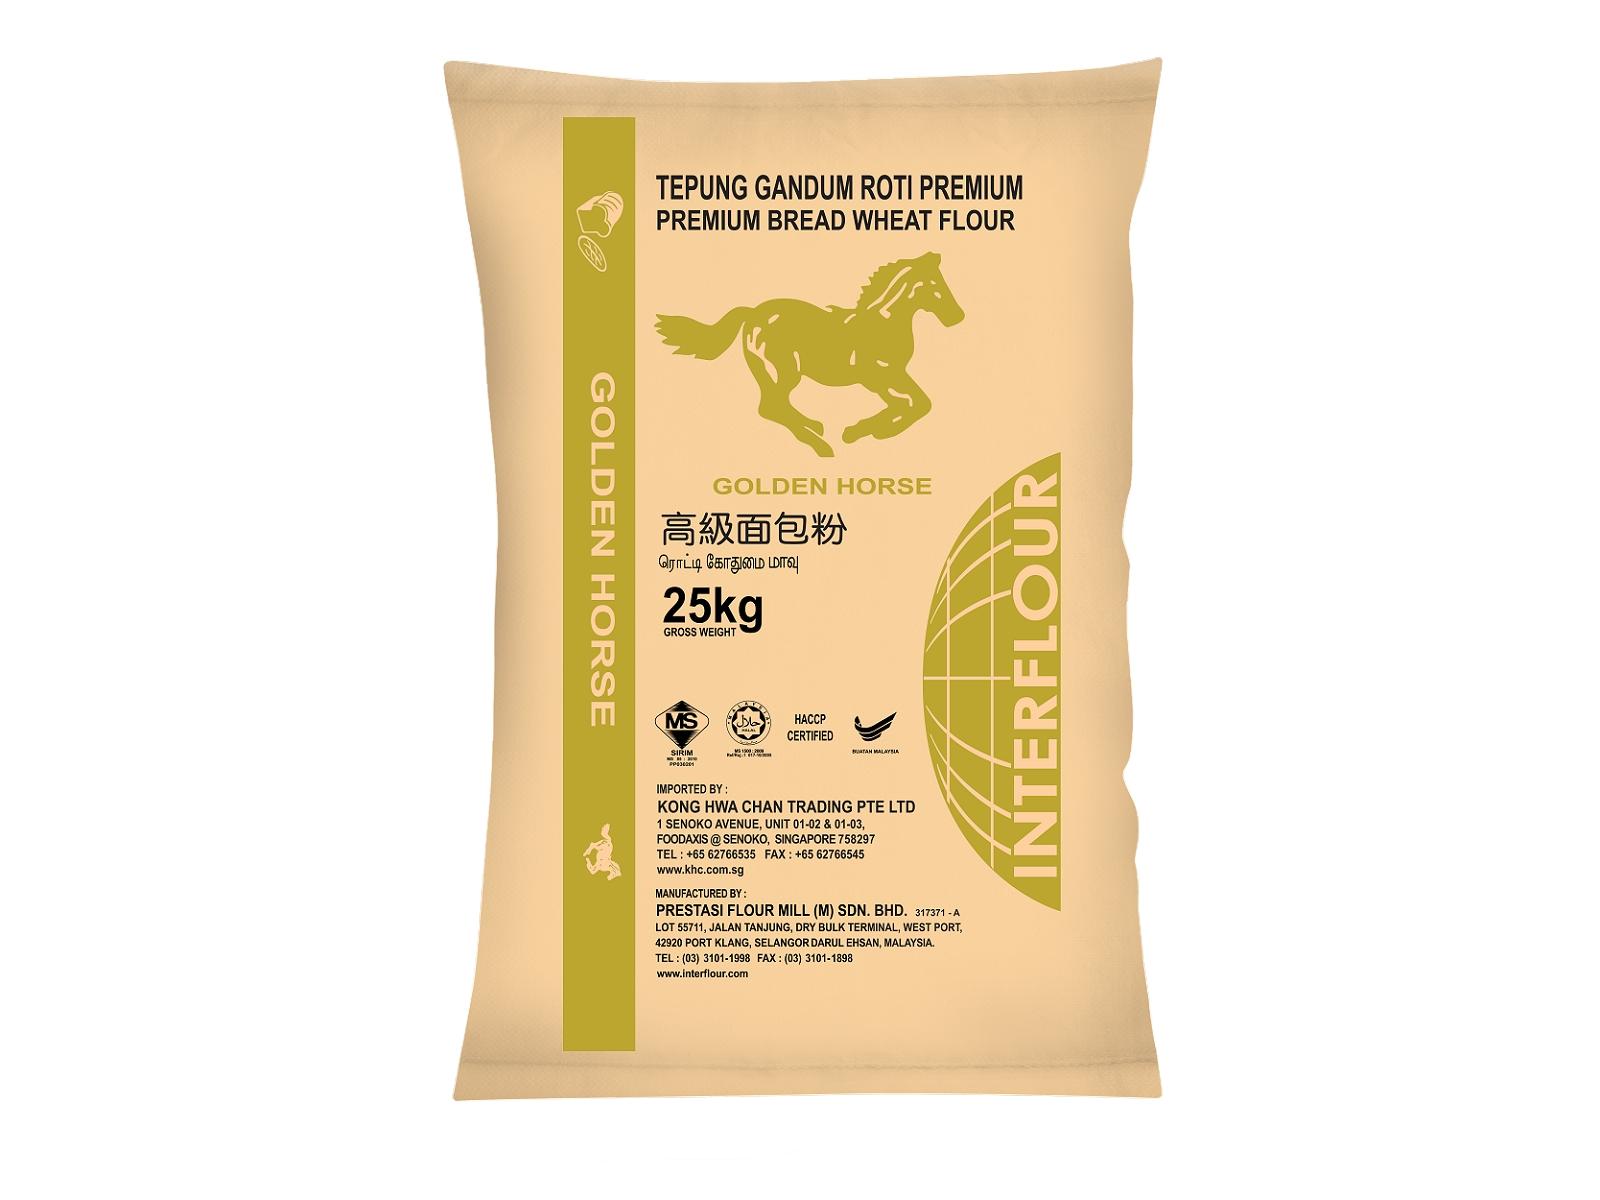 Golden Horse Premium Bread FLour 25kg